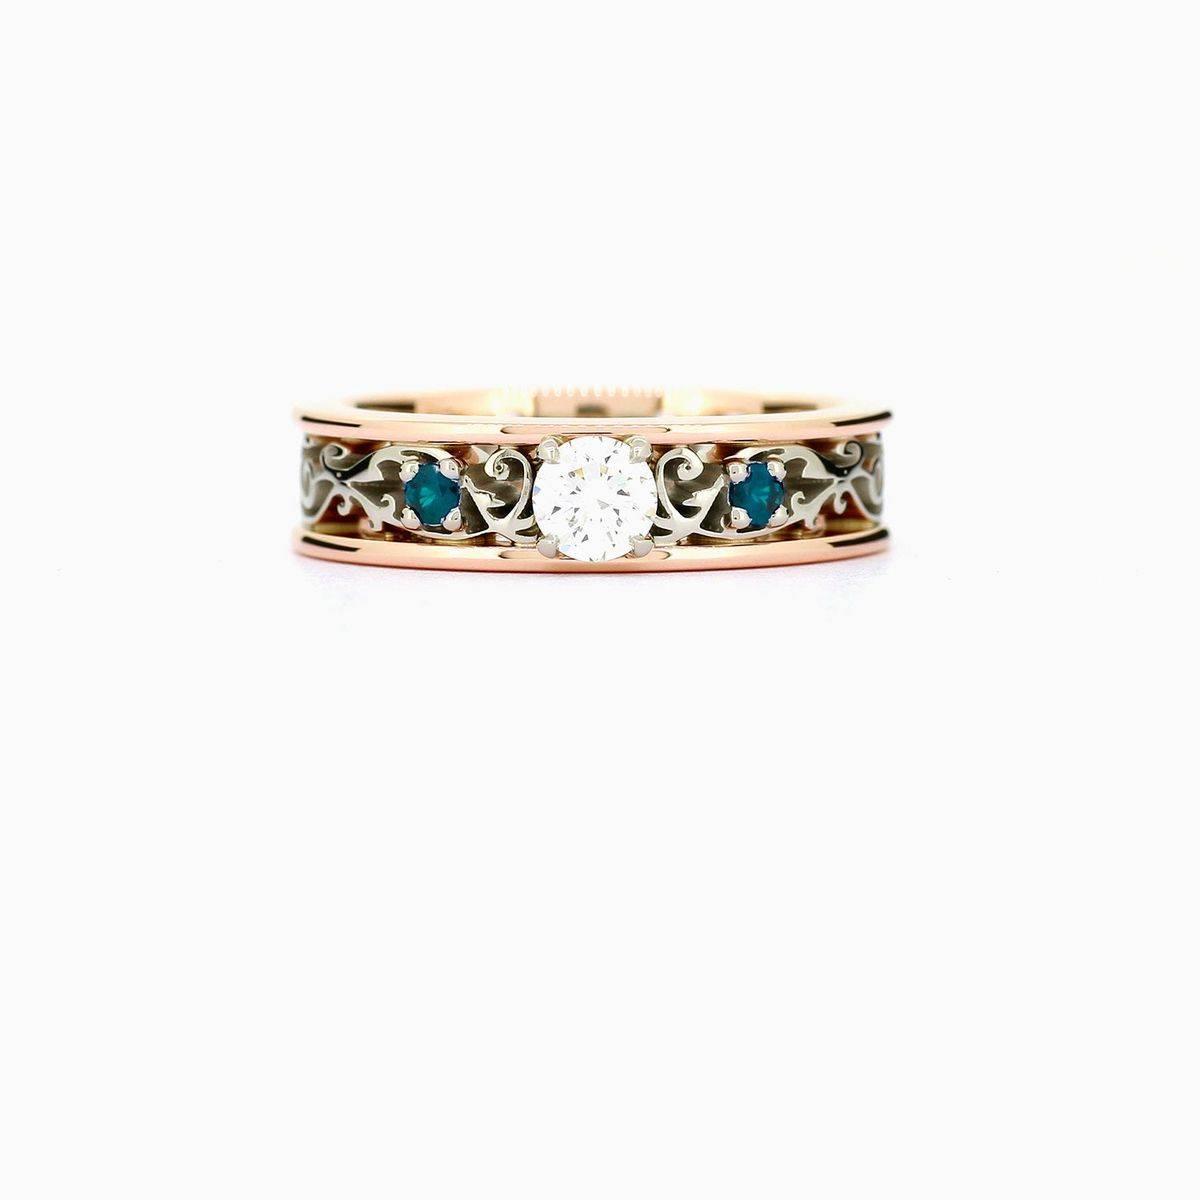 Art deco engagement ring-471118811019840956